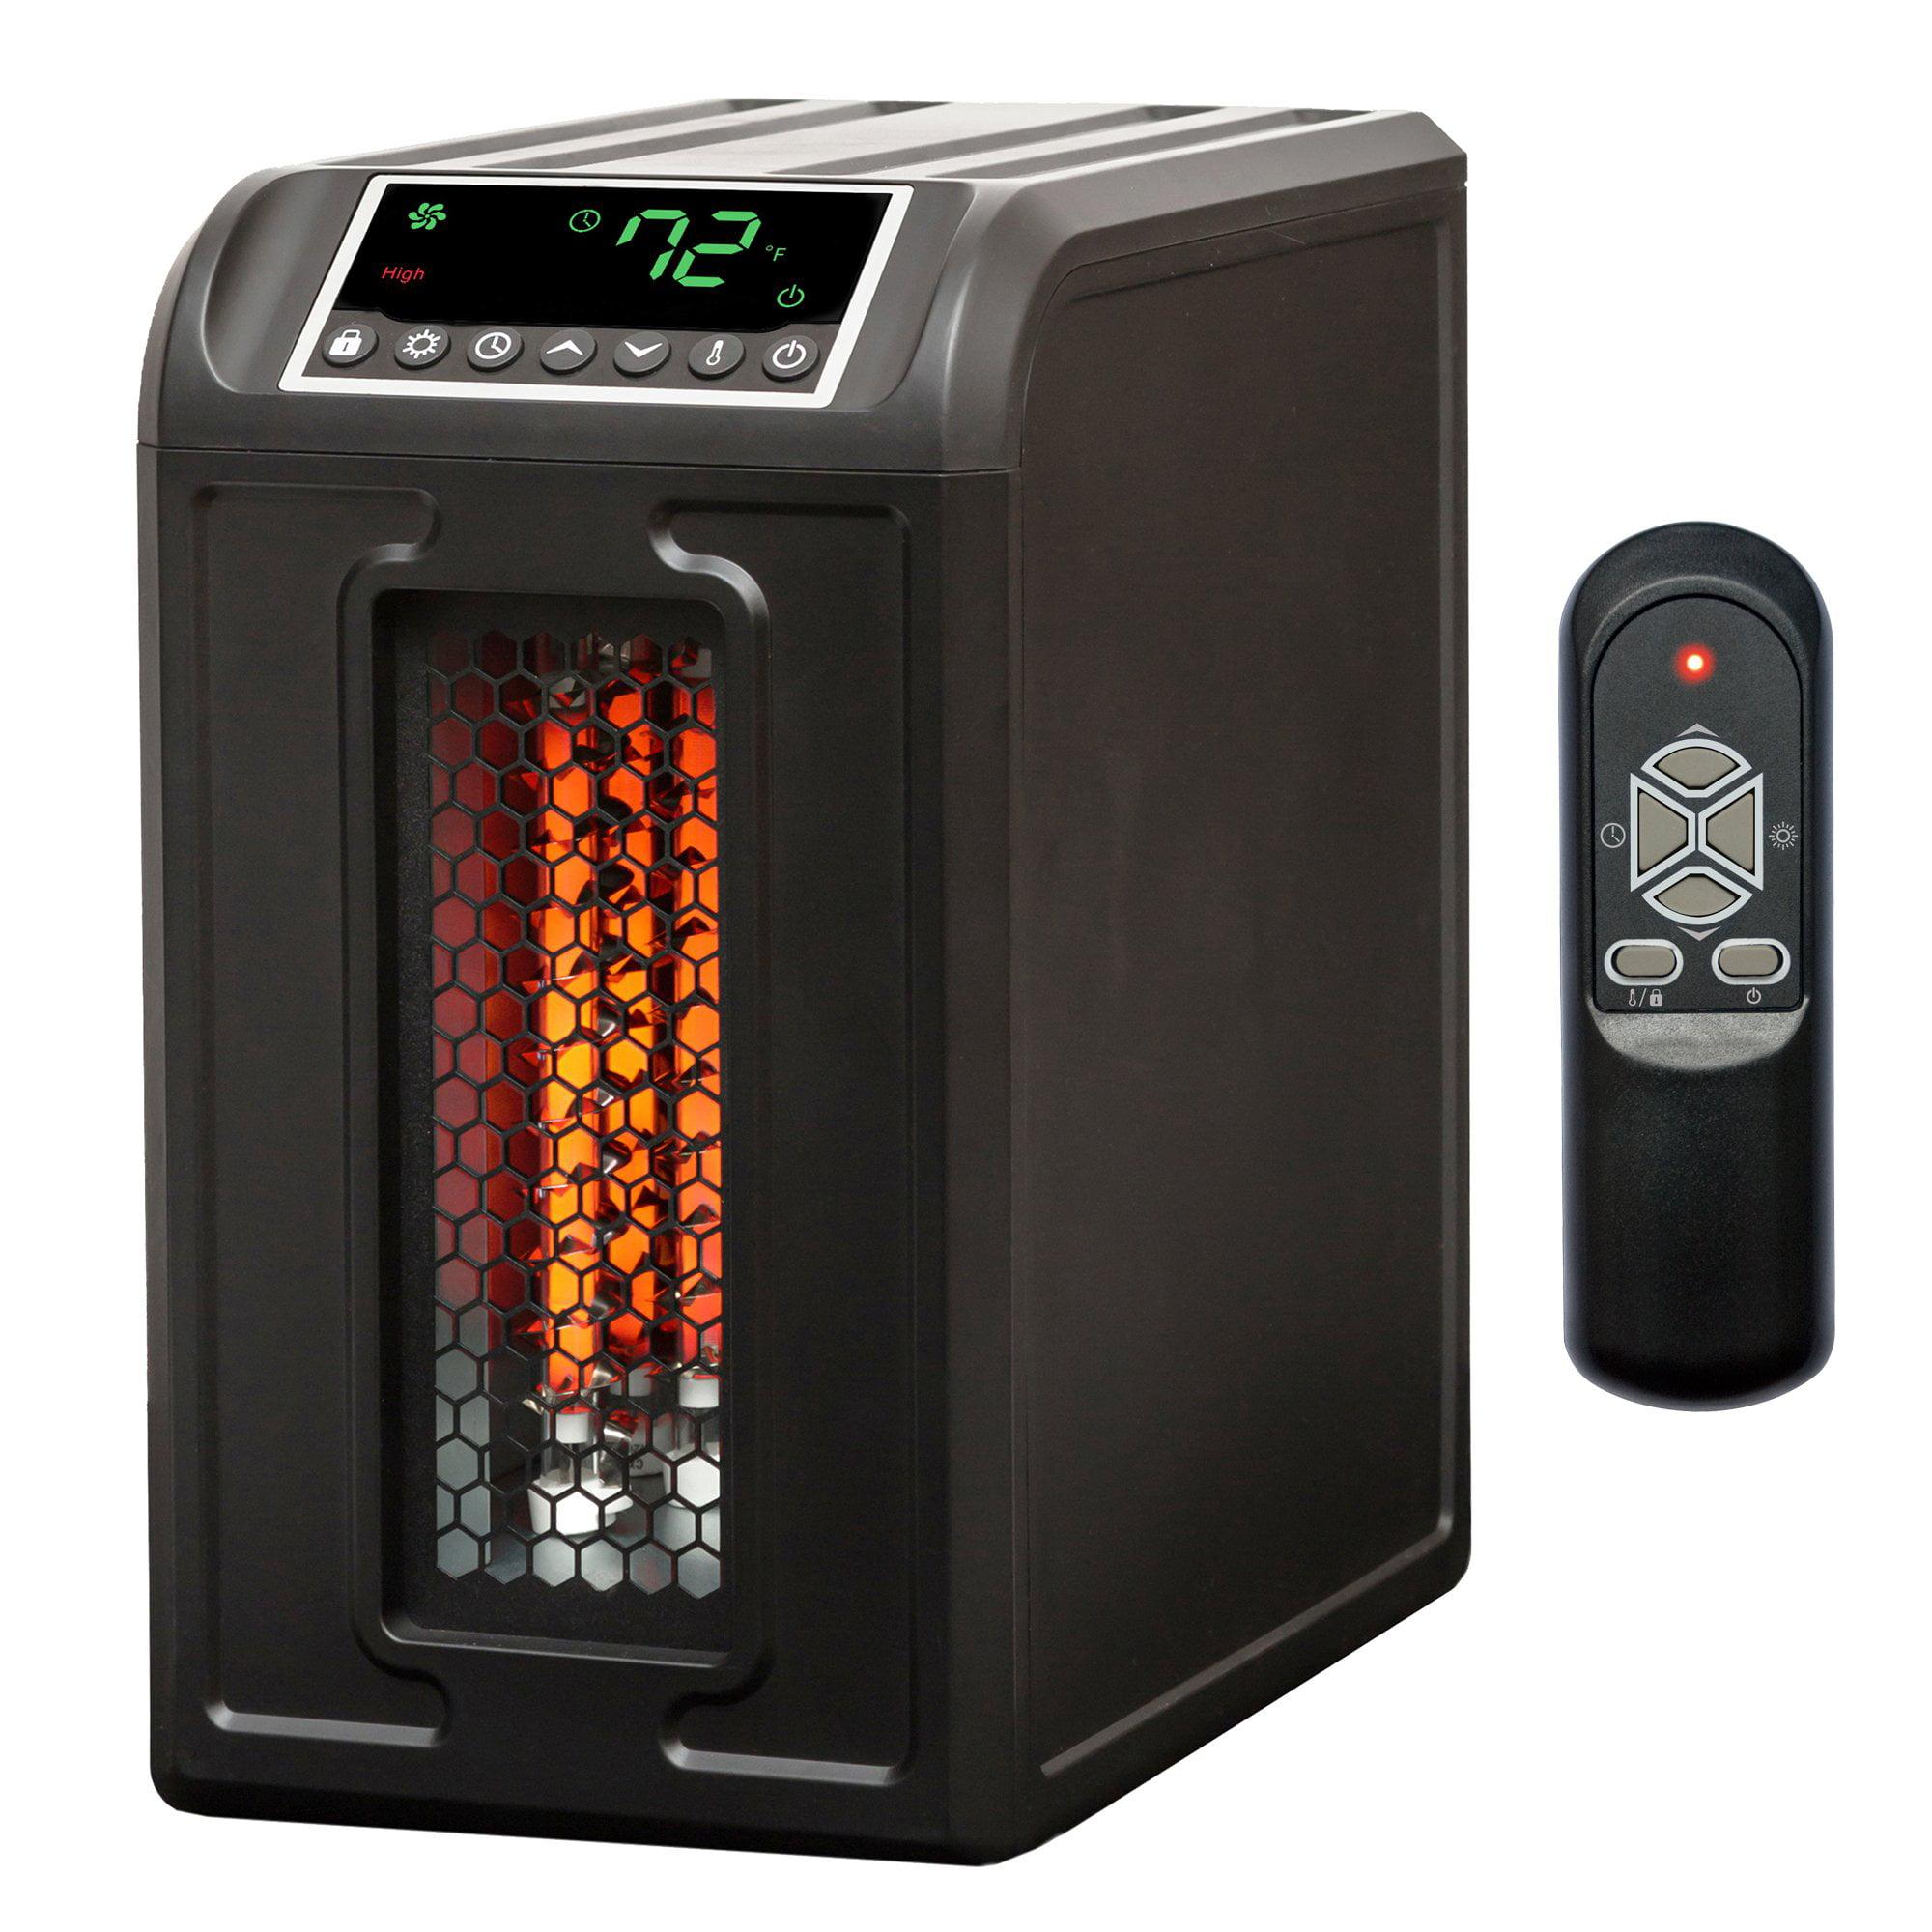 Lifesmart 3 Element 1500W Quartz Infrared Electric Portable Room Space Heater